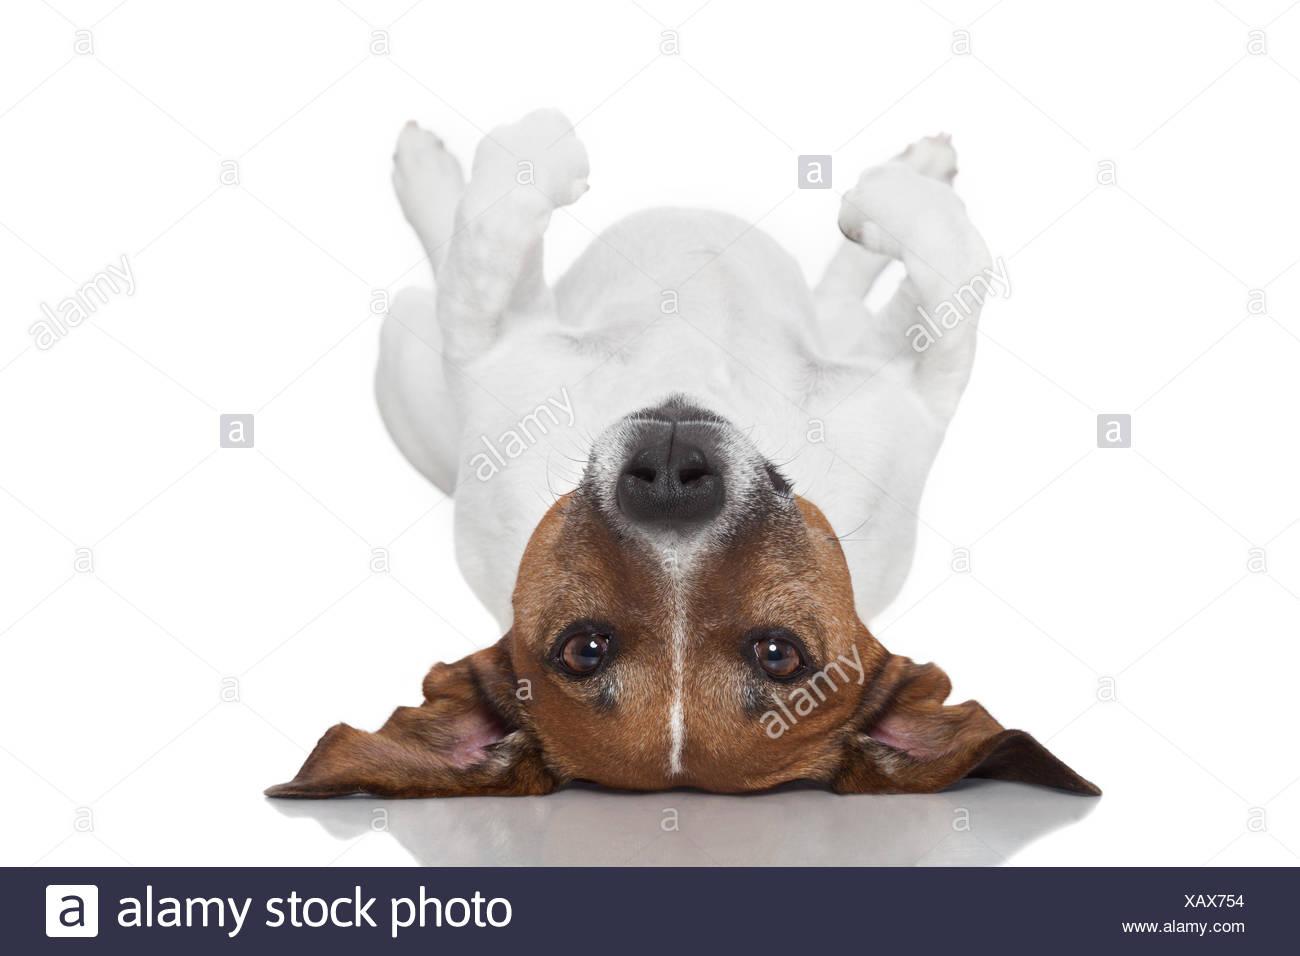 dog  laying upside down - Stock Image